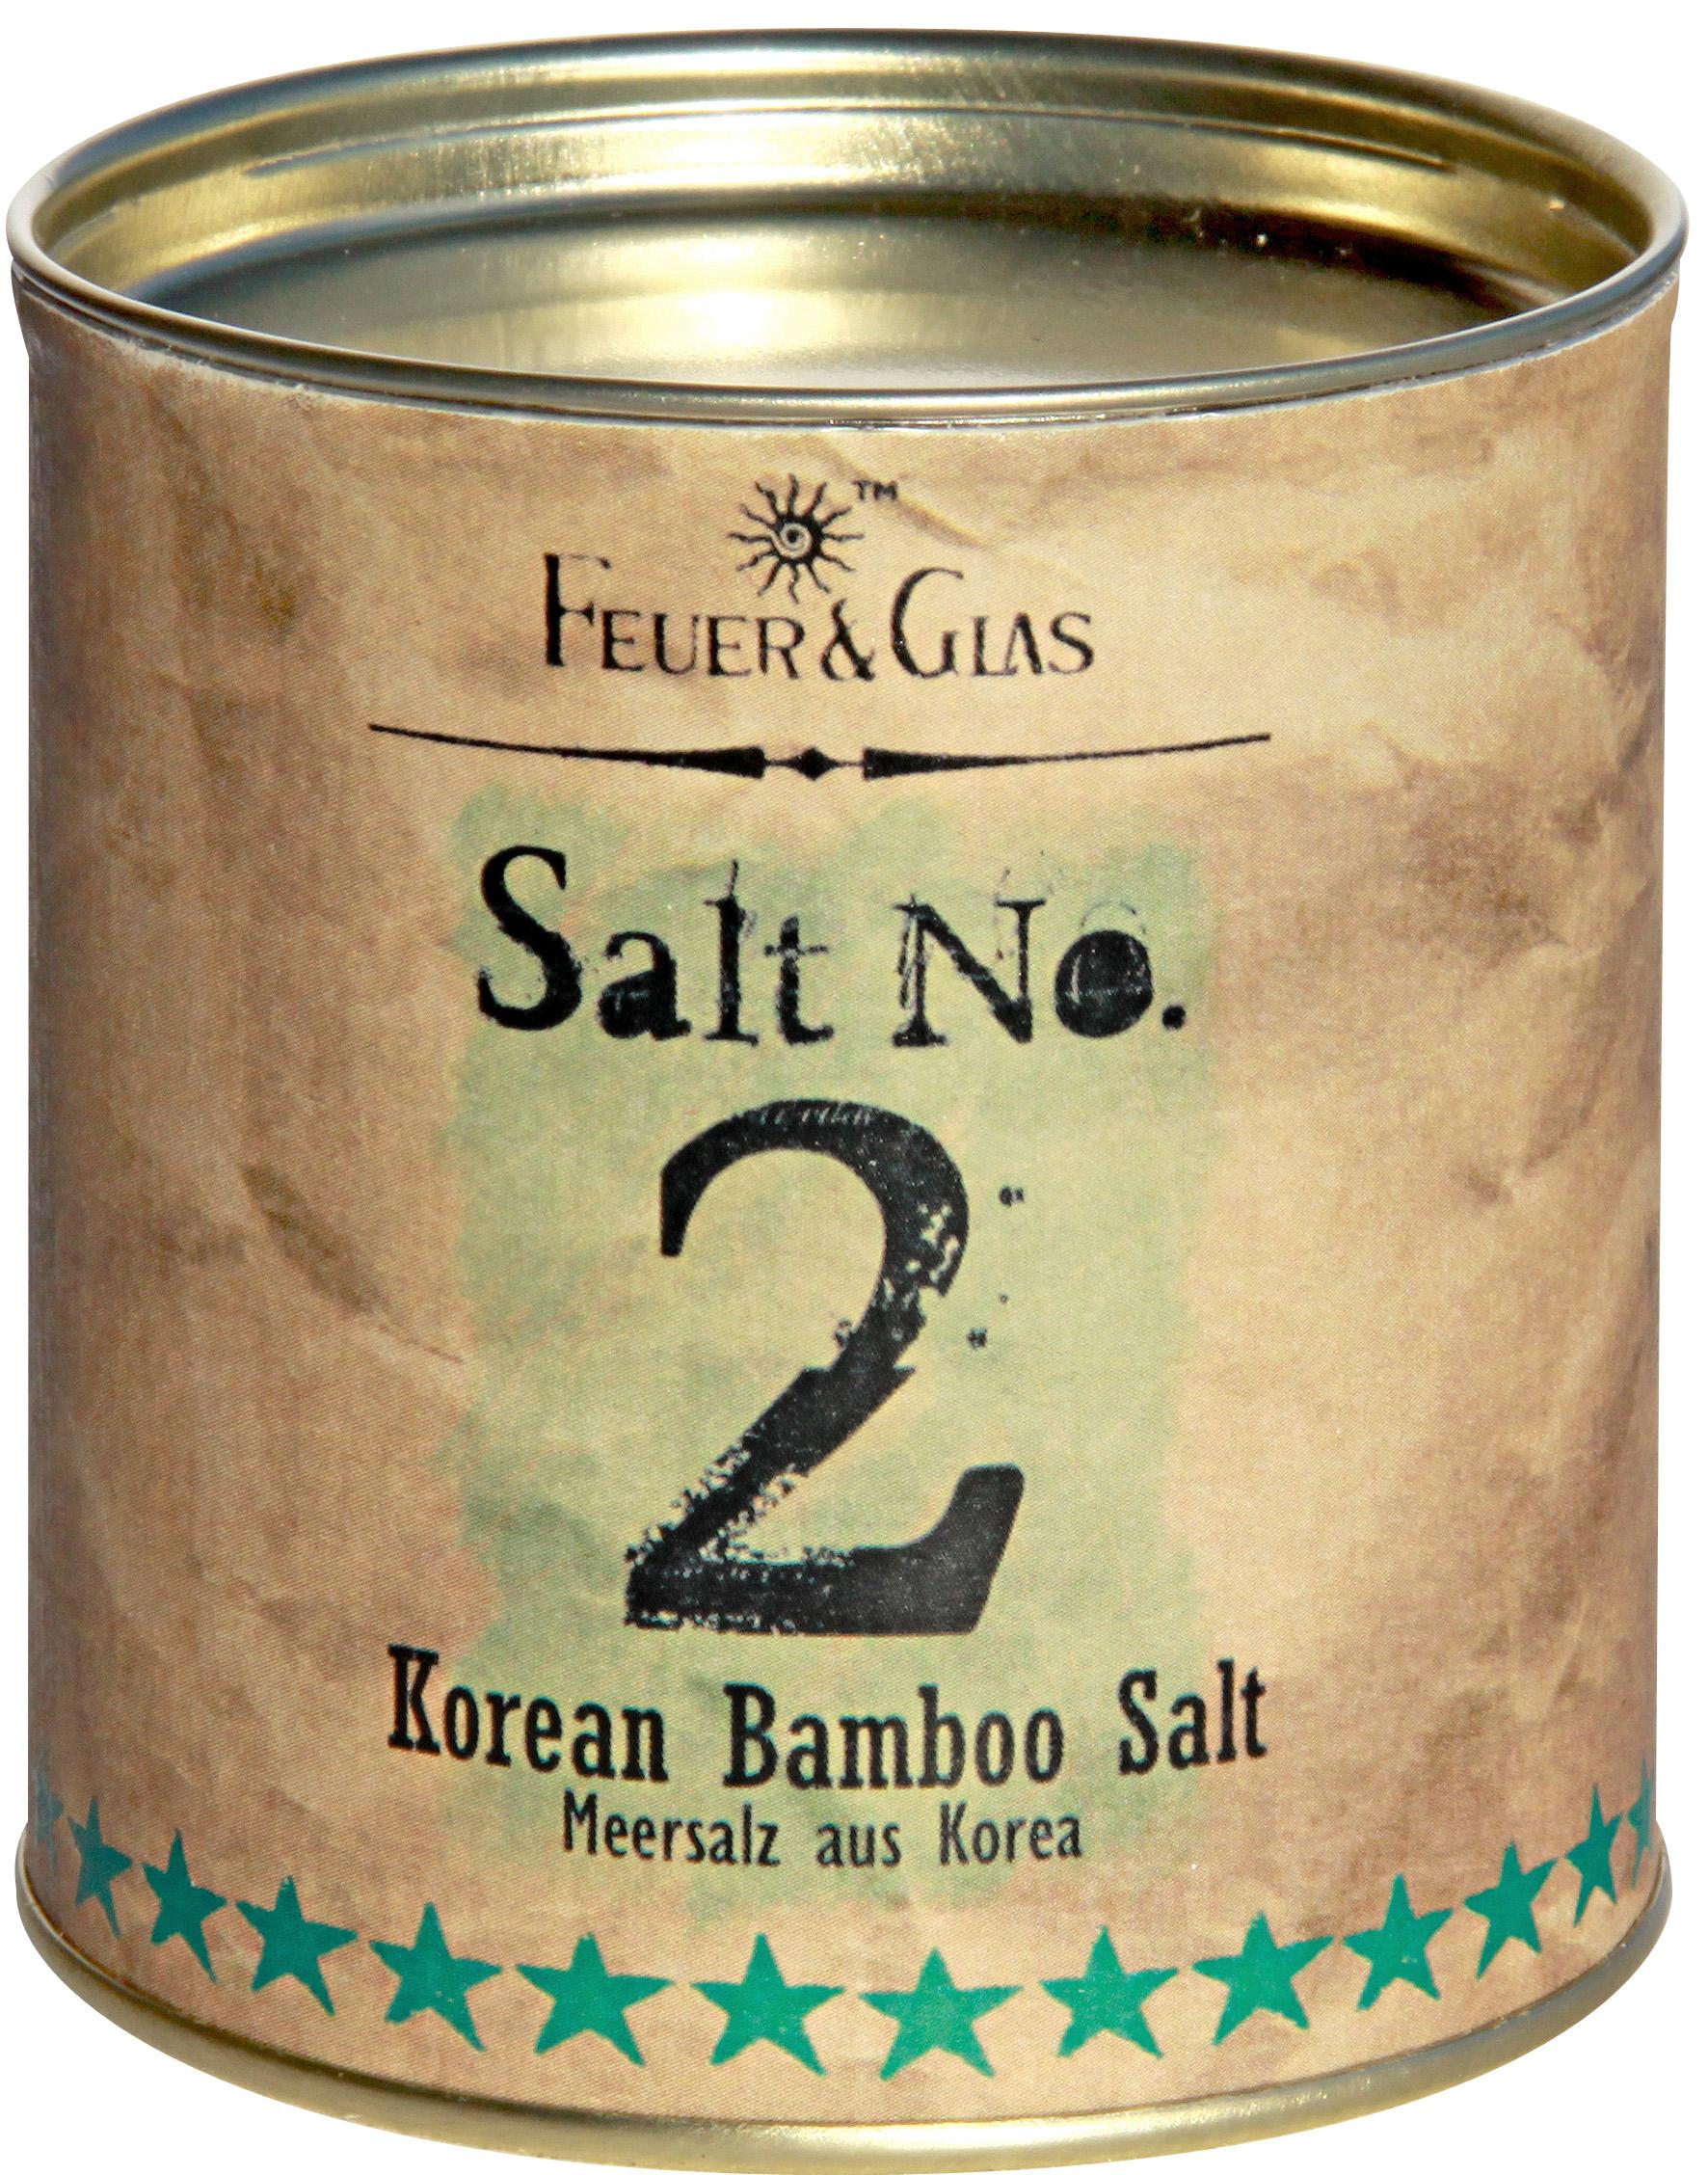 Salt No.2 - Korean Bamboo Salt